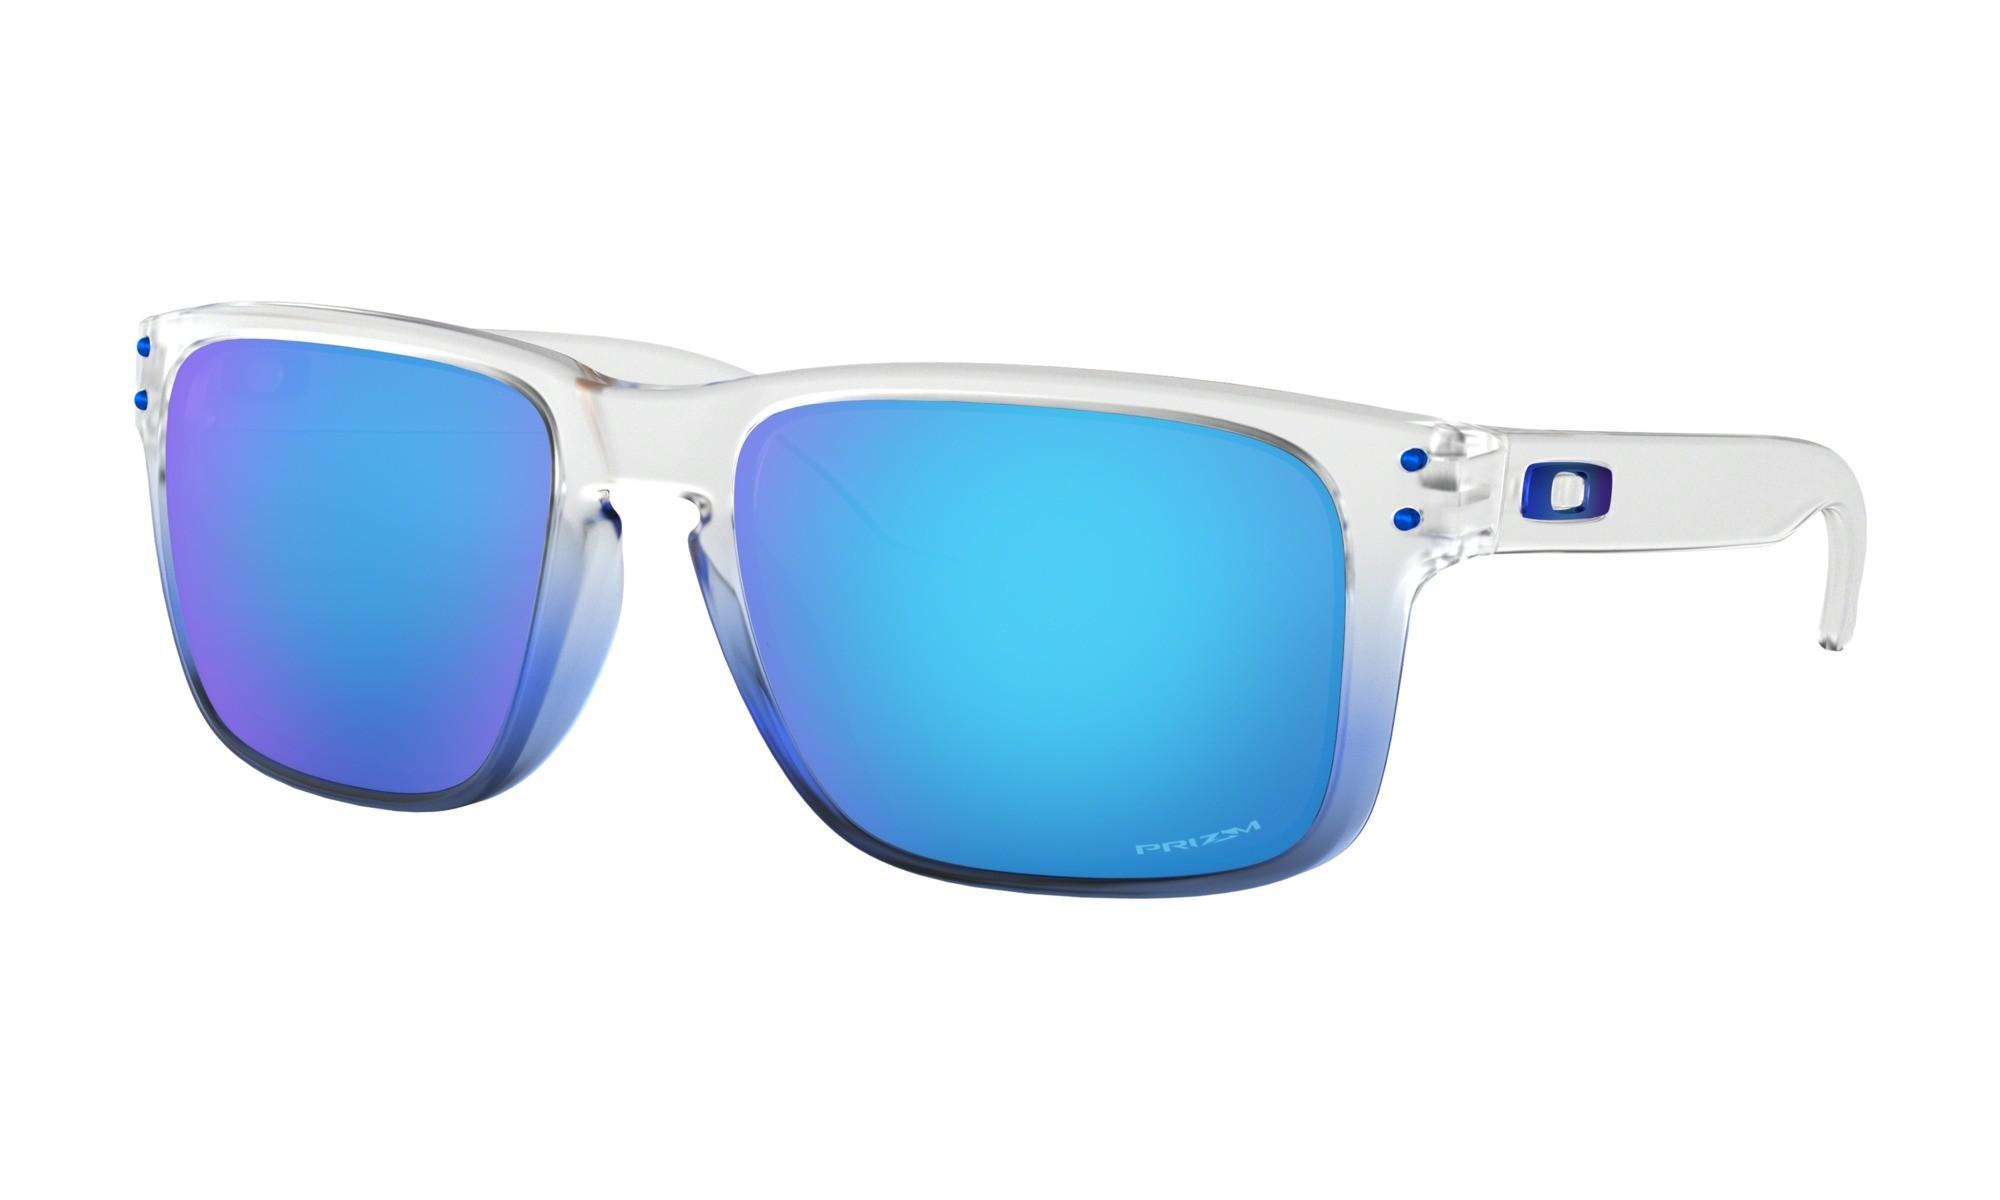 b57b508c48 Oakley Holbrook The Mist Collection Sapphire Mist Prizm Sapphire Sunglasses